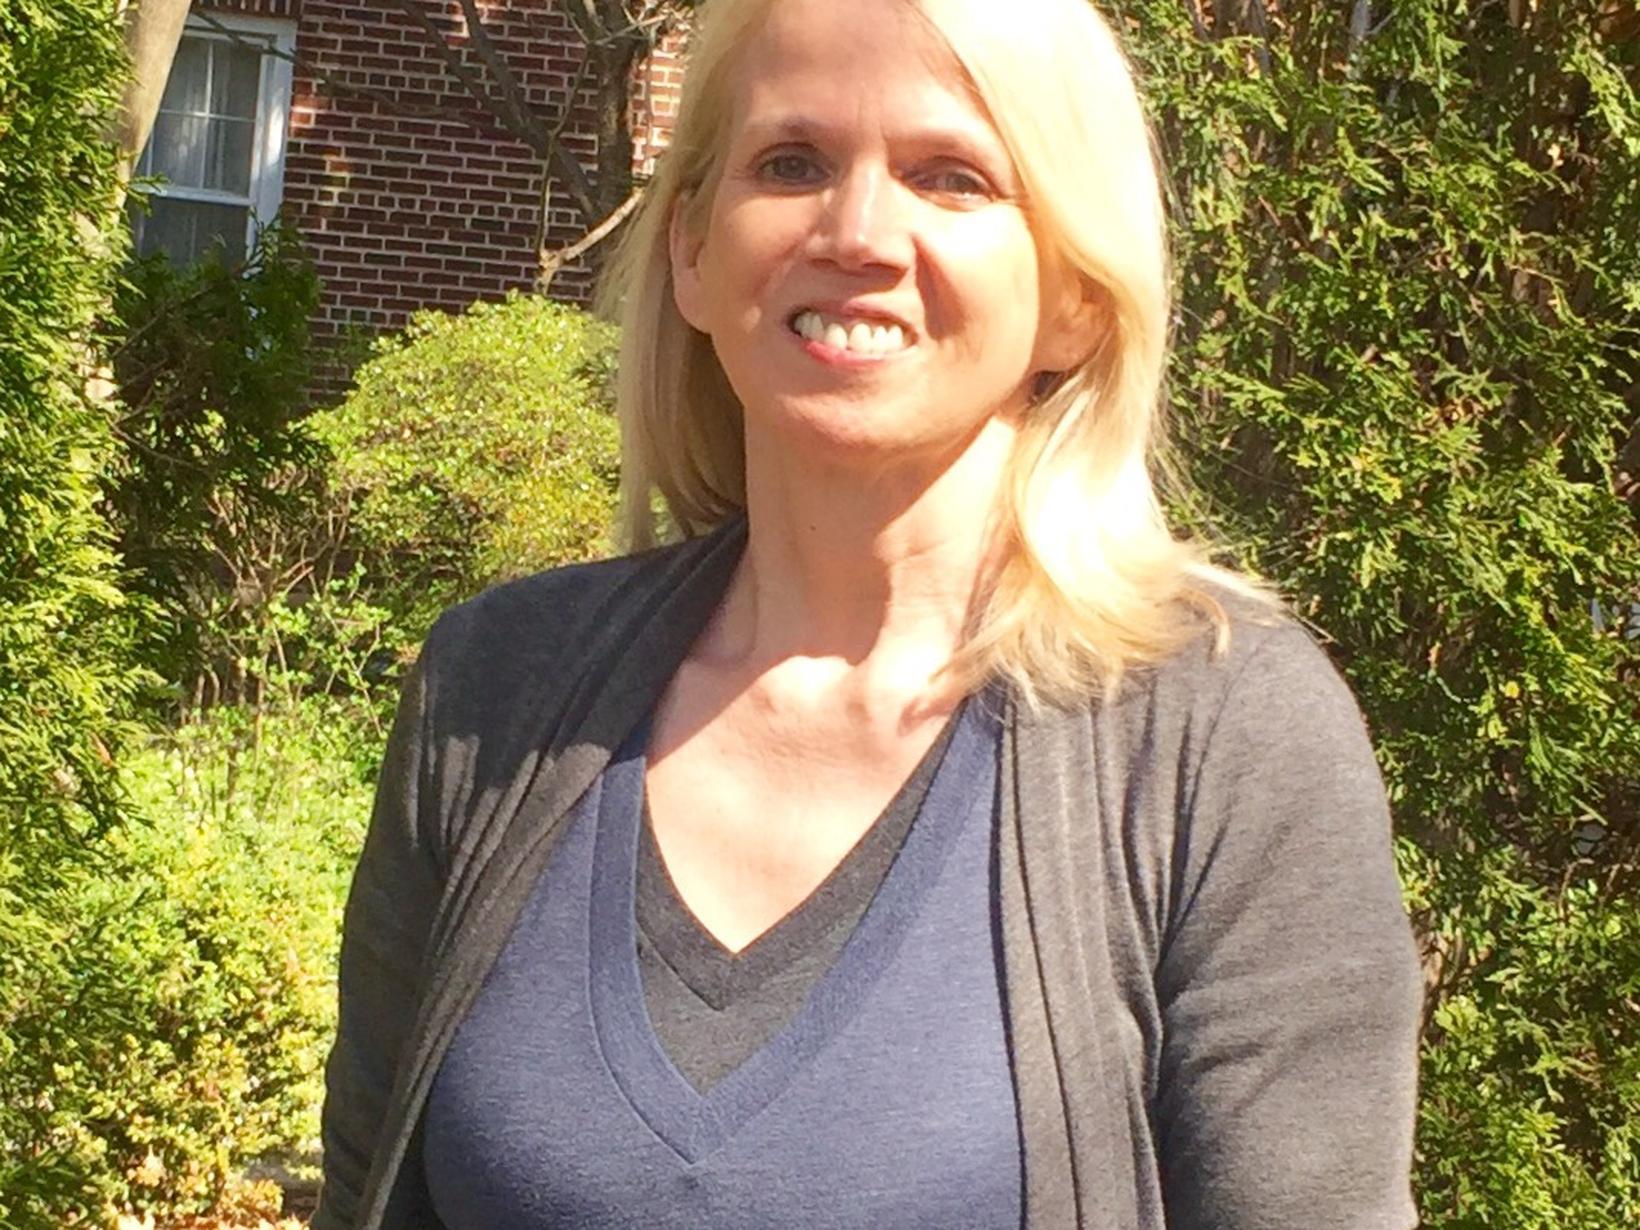 Sara from Gaithersburg, Maryland, United States